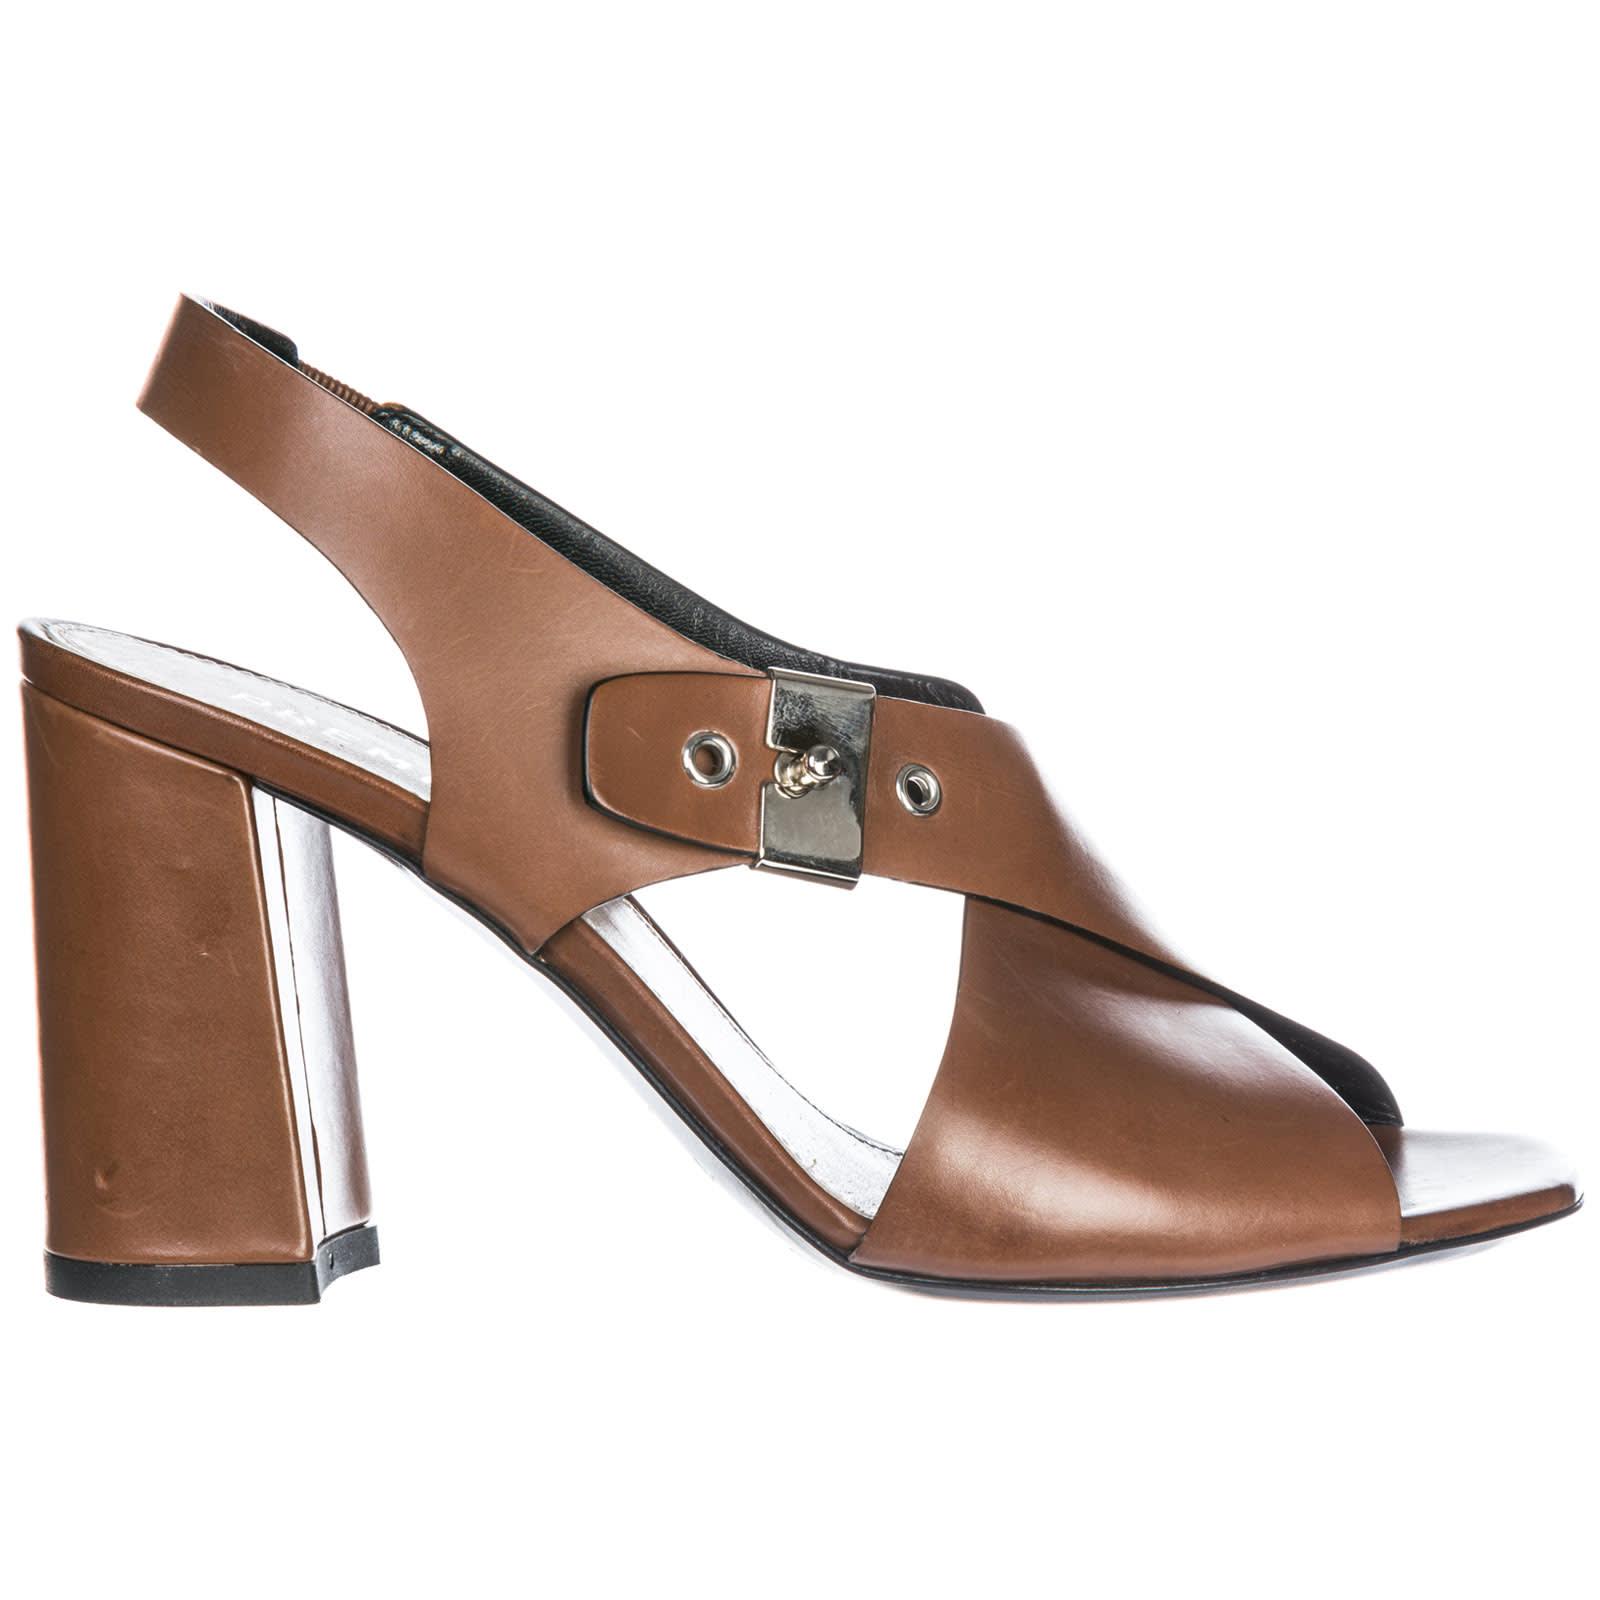 Premiata Tarvin Sandals